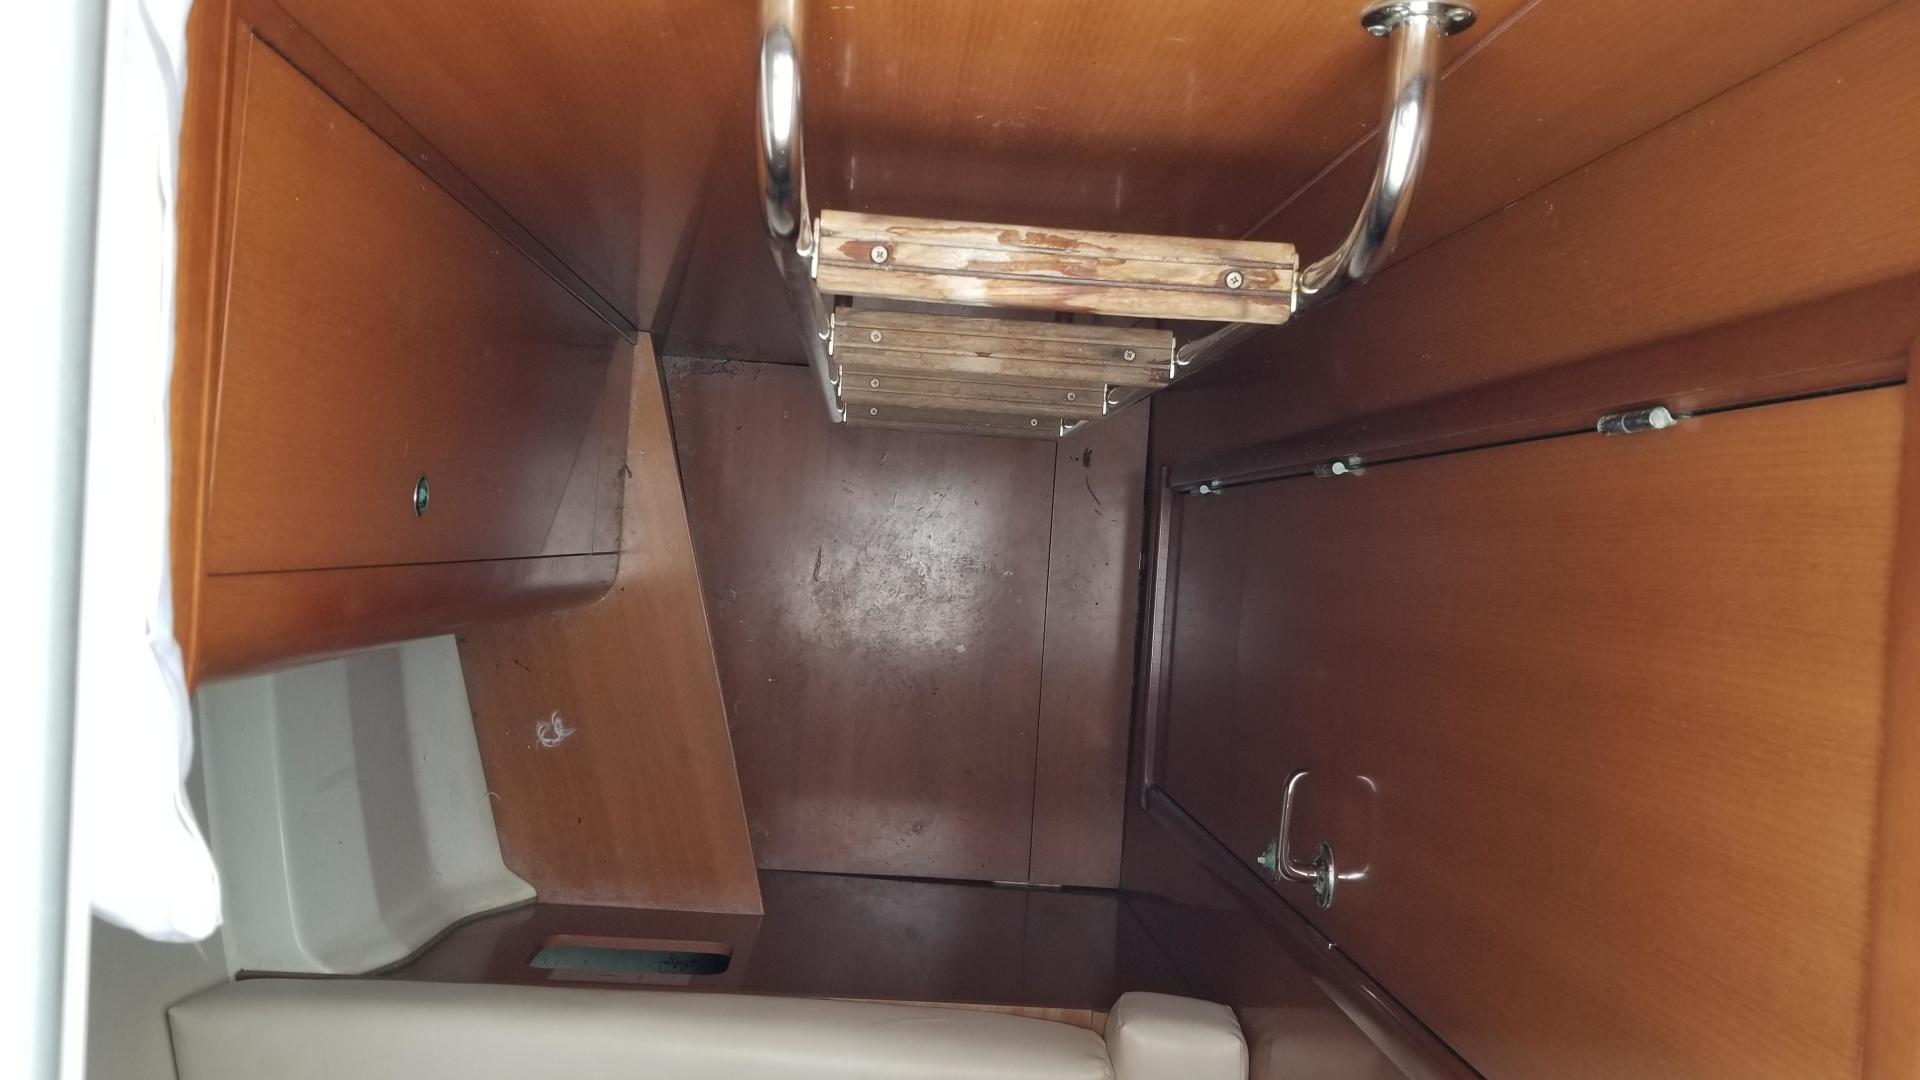 Beneteau-523 2007-FIRST LOVE Fort Pierce-Florida-United States-1427735 | Thumbnail